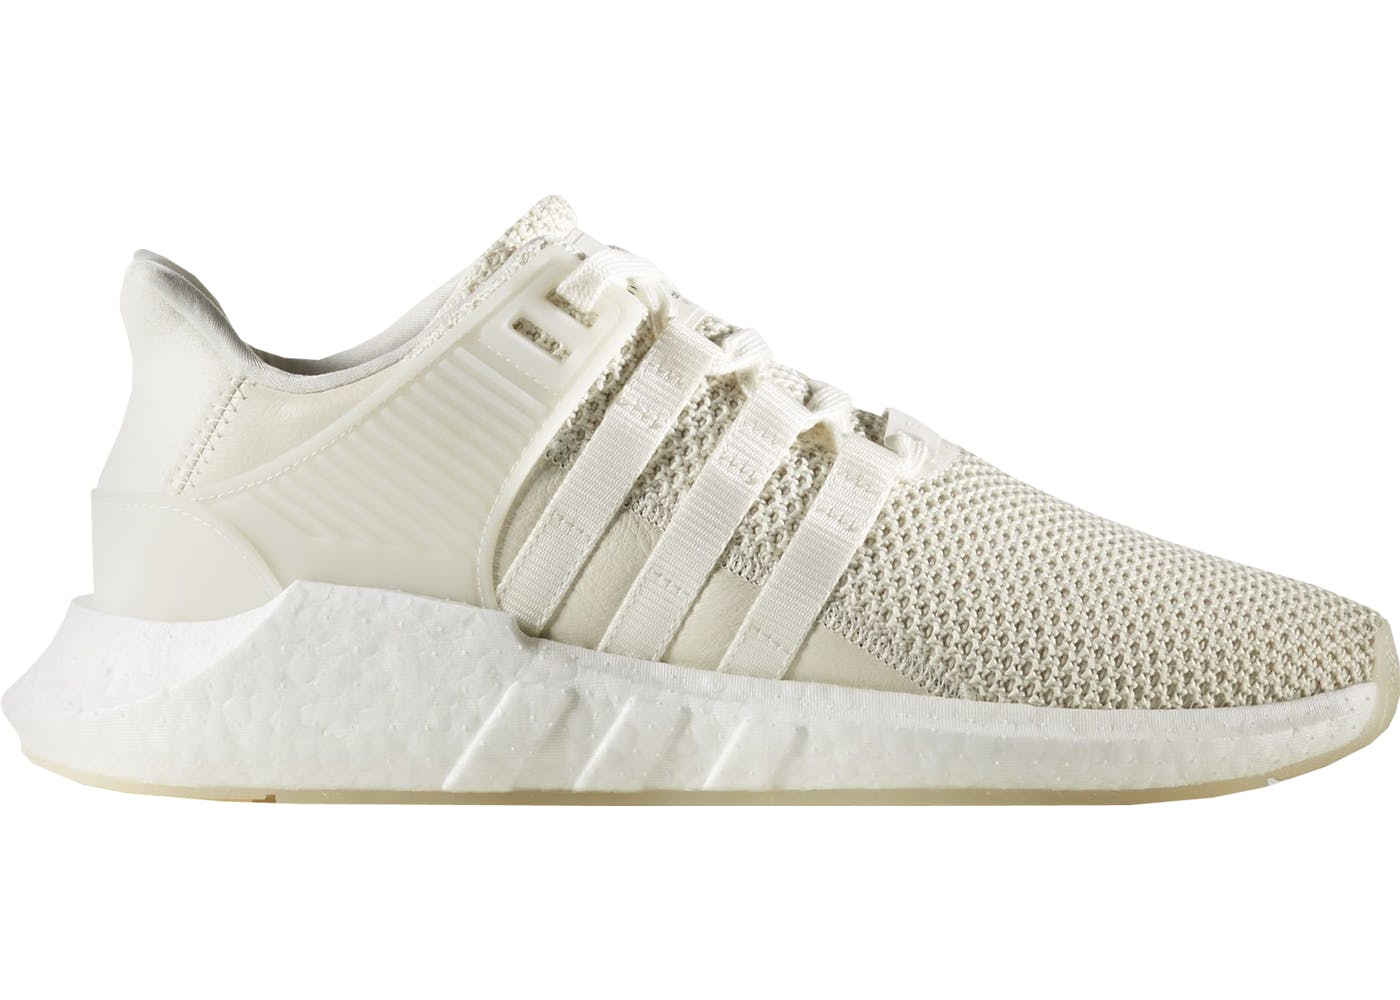 Adidas EQT Support RF BA7715 Mens Sneakers Equipment White